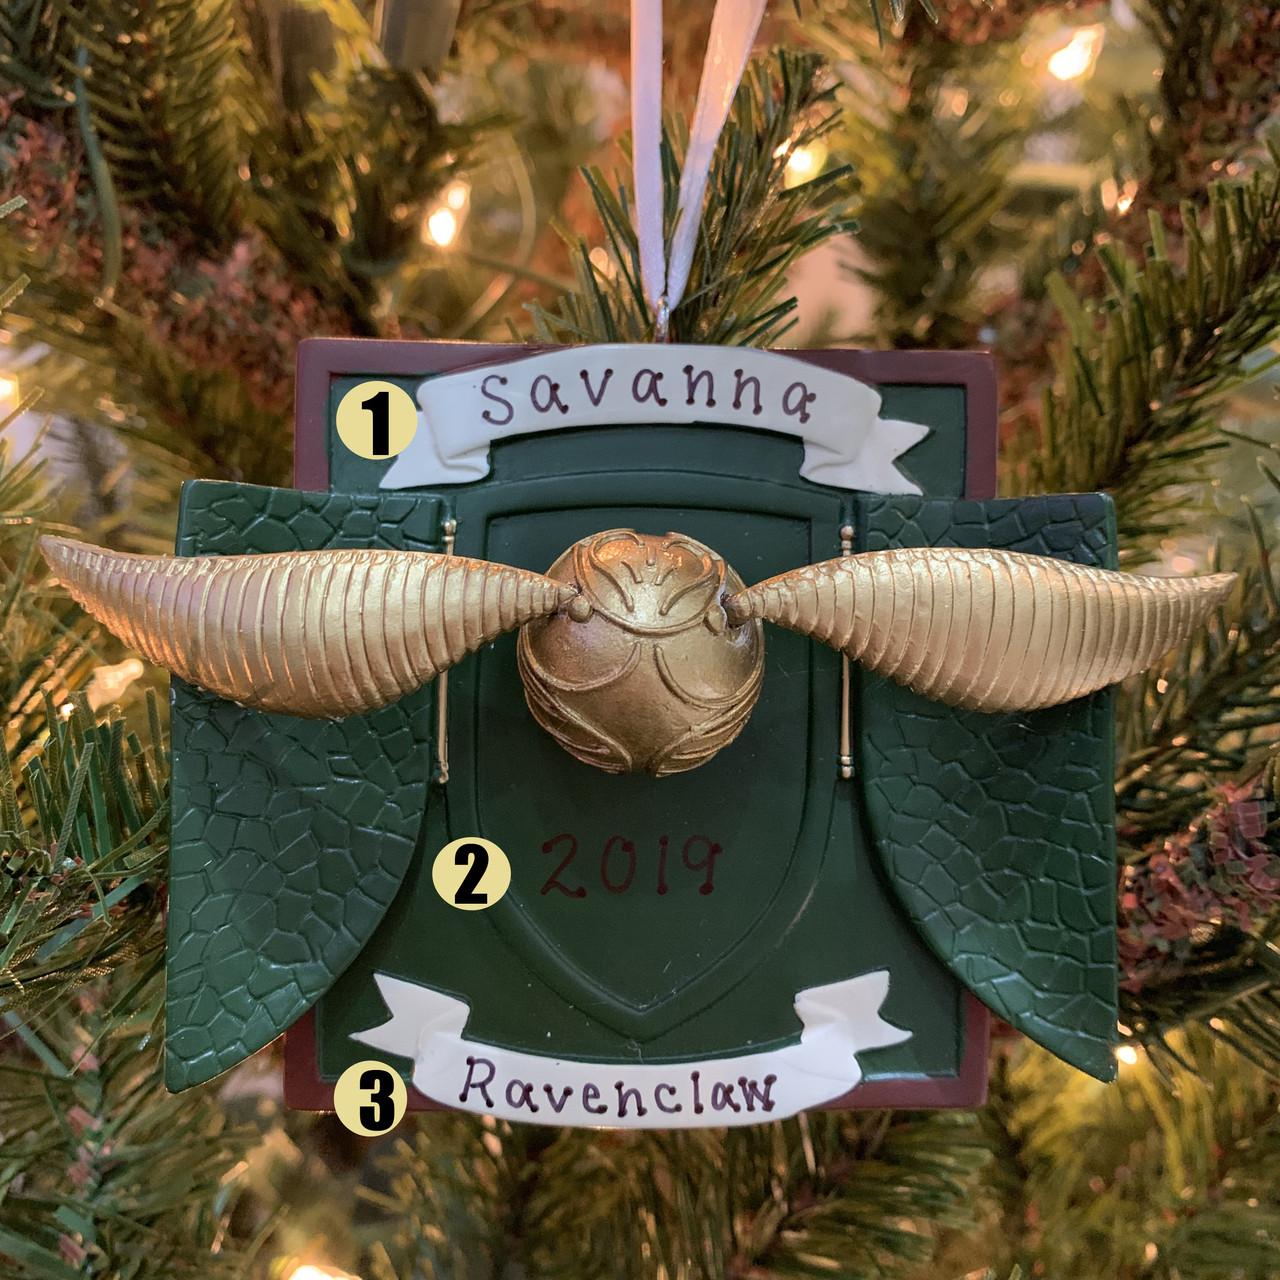 Hallmark 3 Harry Potter Golden Snitch Personalized Christmas Ornament Hallmark Christmas Christmas Ornament Unique Christmas Ornament Harry Potter Christmas Ornament Personalized Christmas Ornament